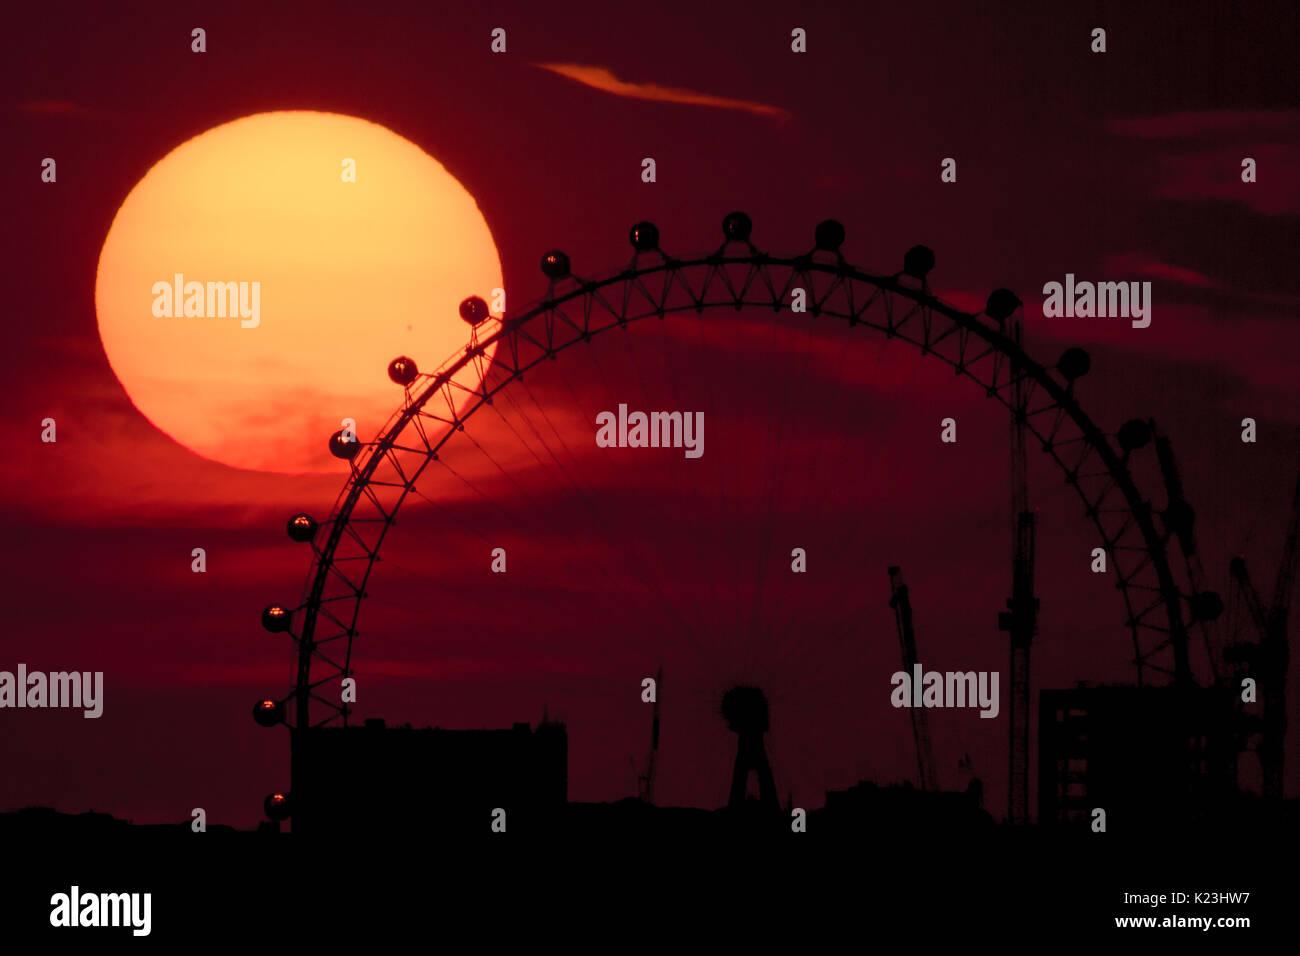 London, UK. 28th August, 2017. UK Weather: Dramatic sunset behind London Eye Ferris Wheel ending the bank holiday heatwave © Guy Corbishley/Alamy Live News - Stock Image